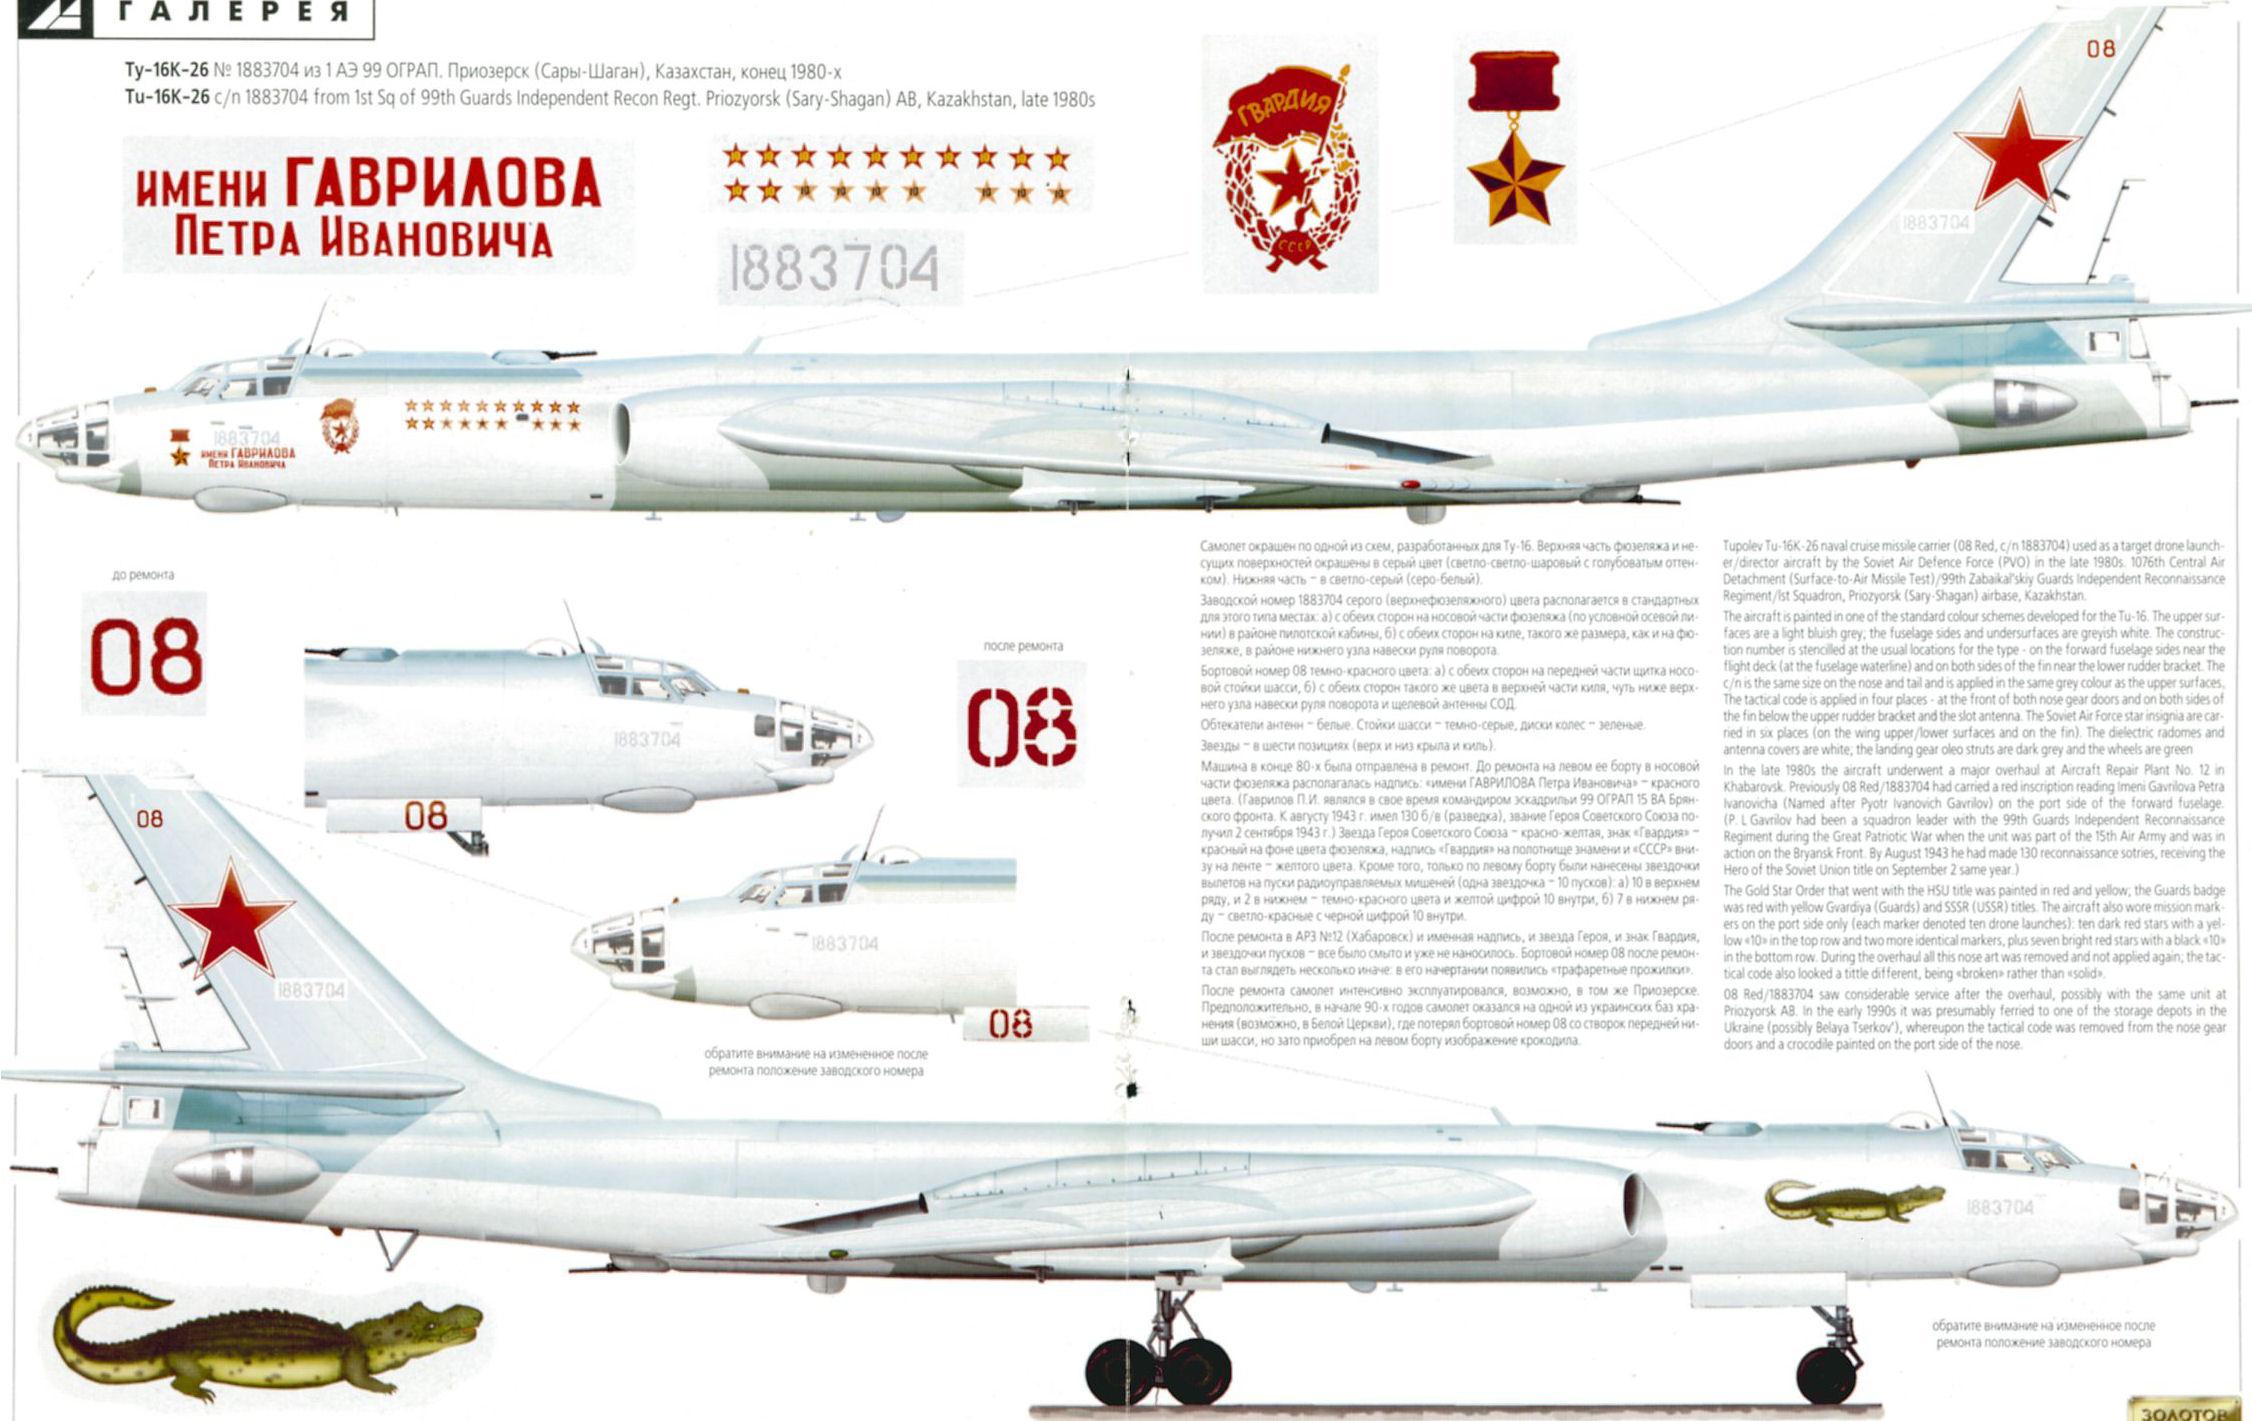 http://karopka.ru/upload/comments/9fb/26-1.jpg